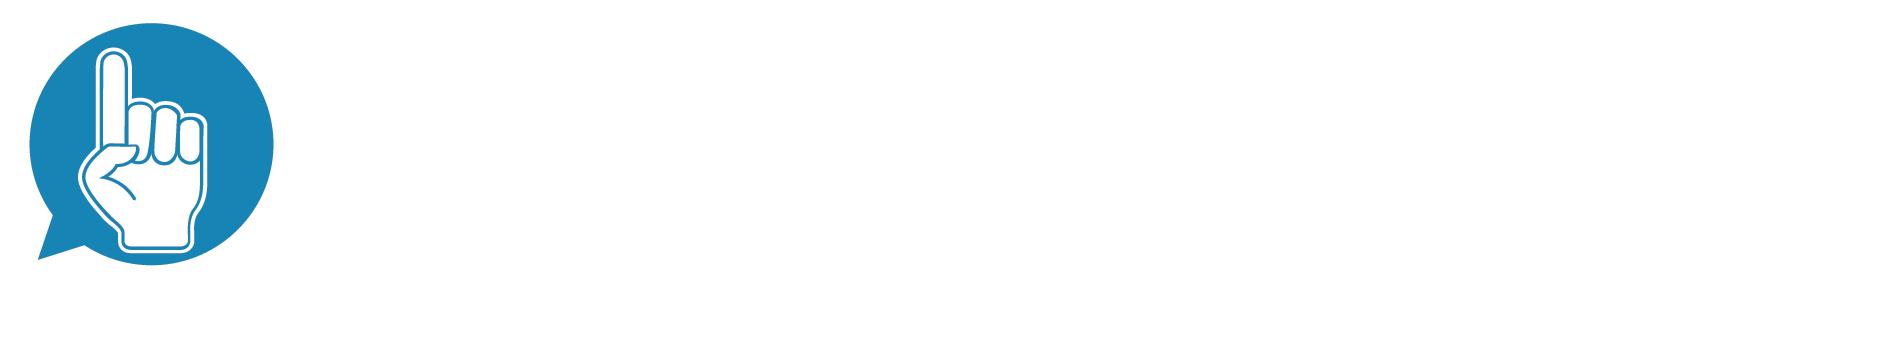 Oru Story Social Media Logo